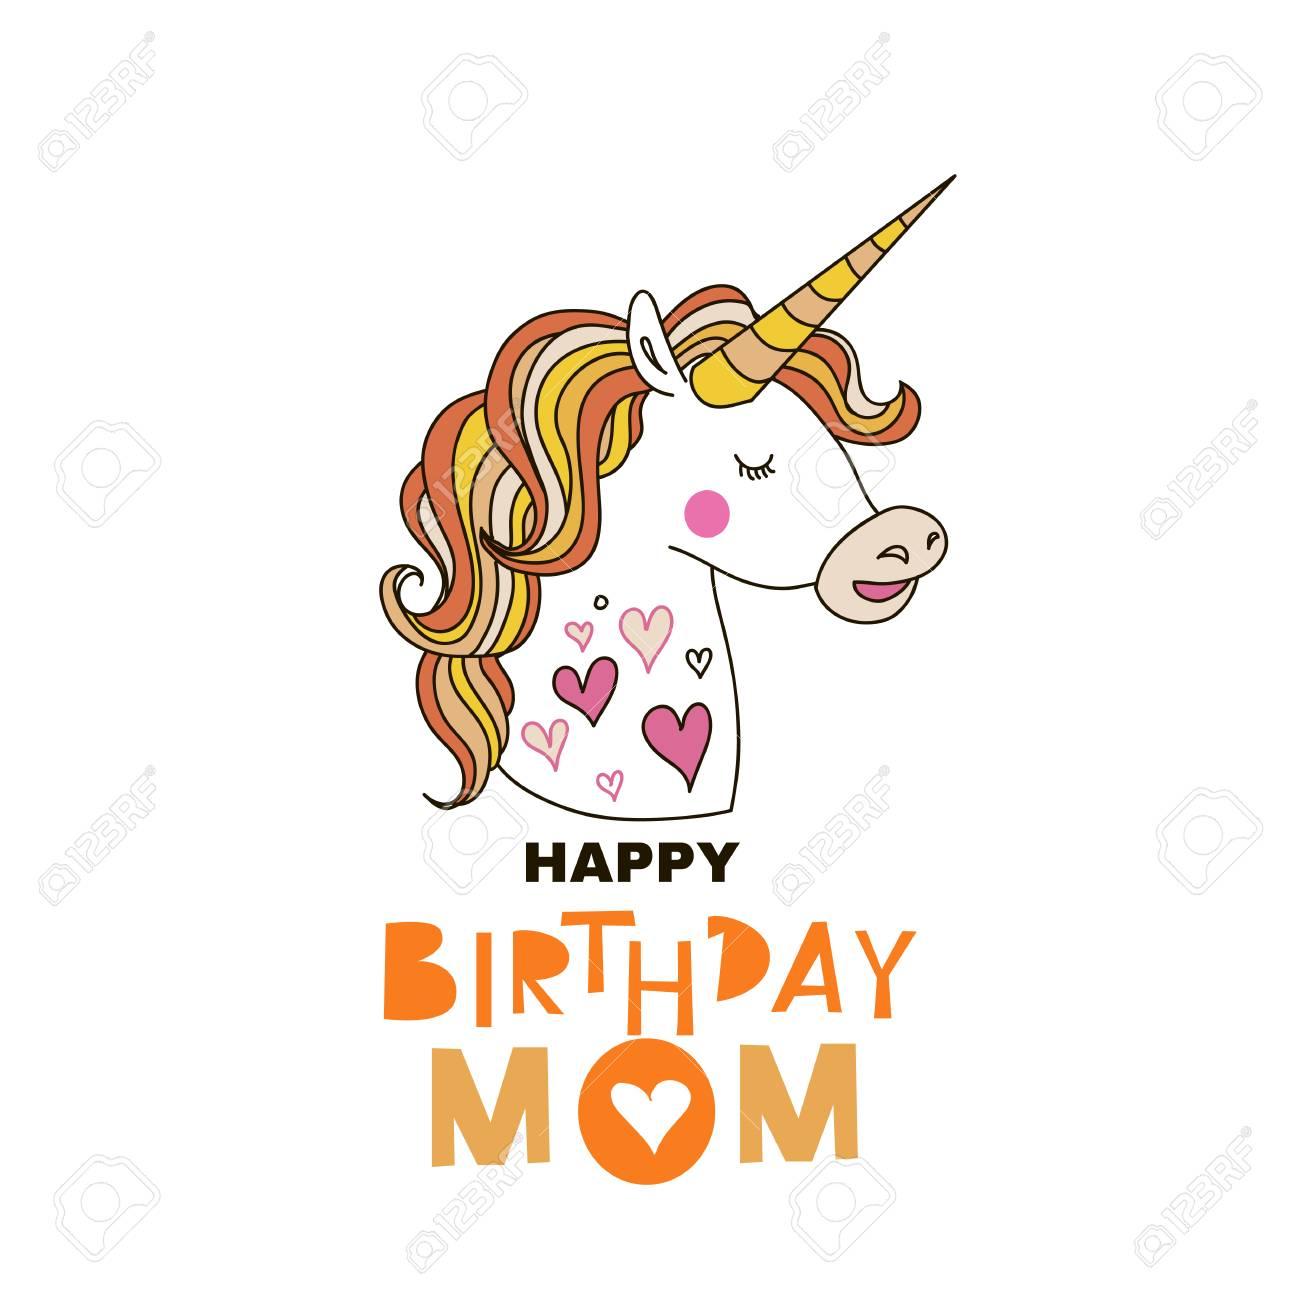 Birthday Greeting Card Designute Hand Drawn Unicorn